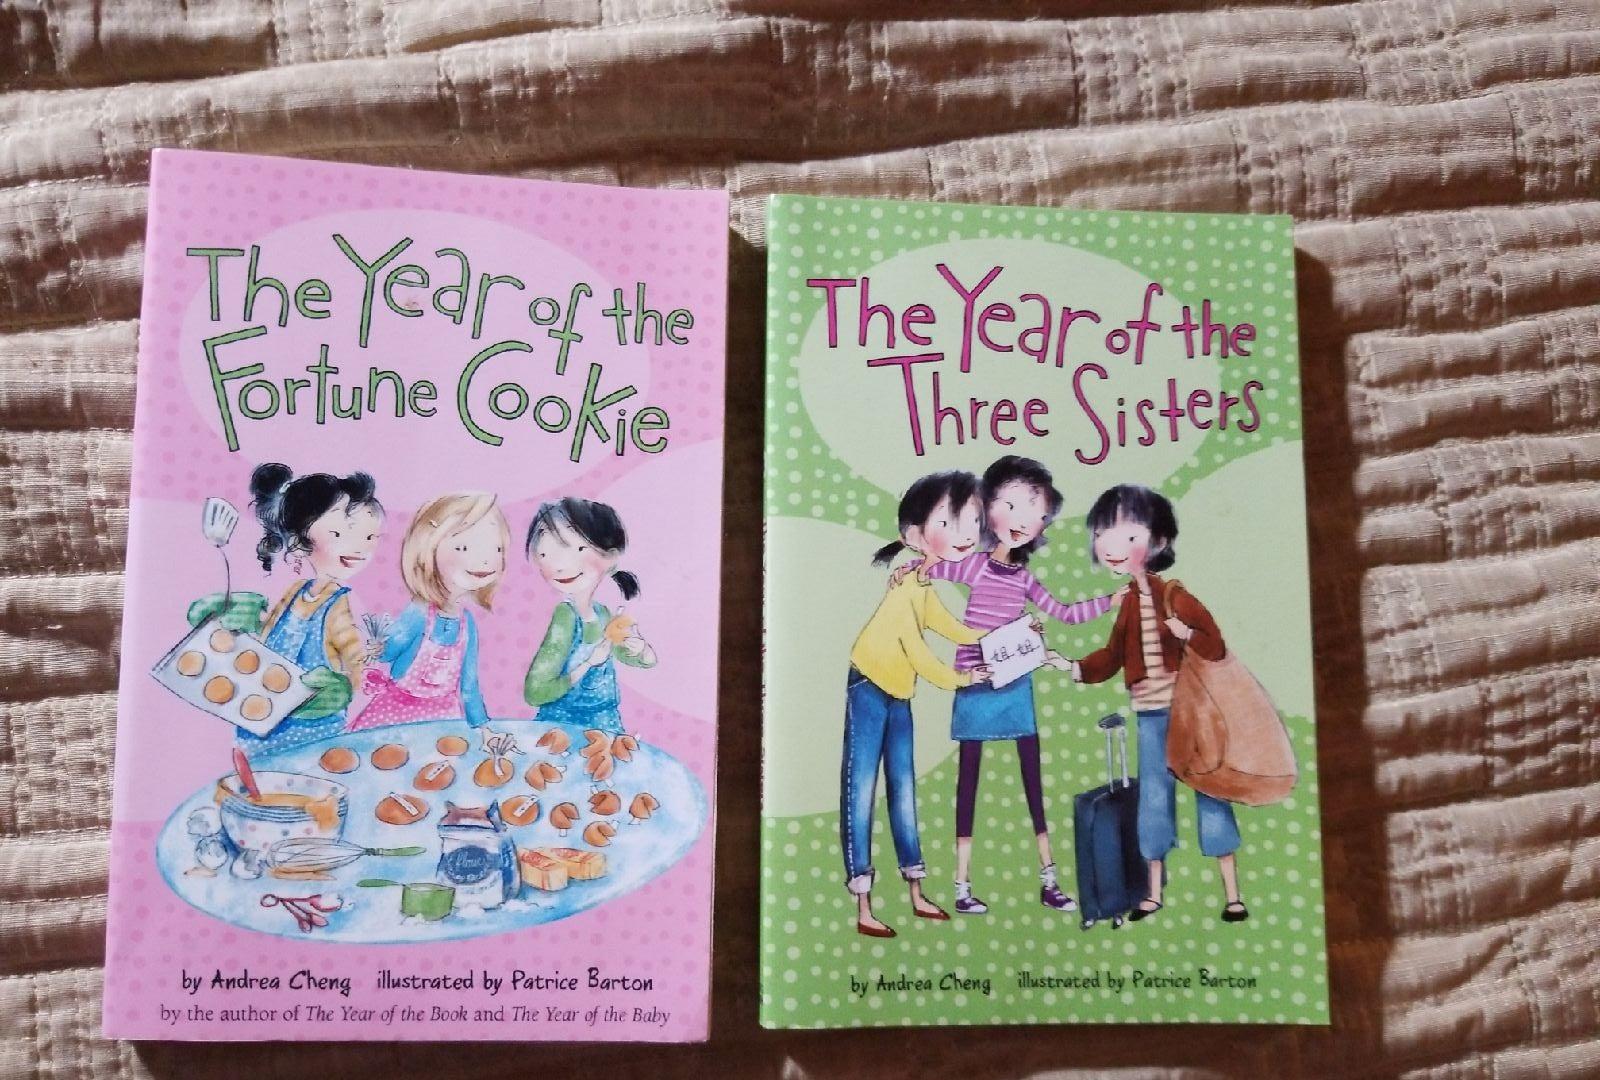 2 Anna Wang Books. Andrea Cheng PB